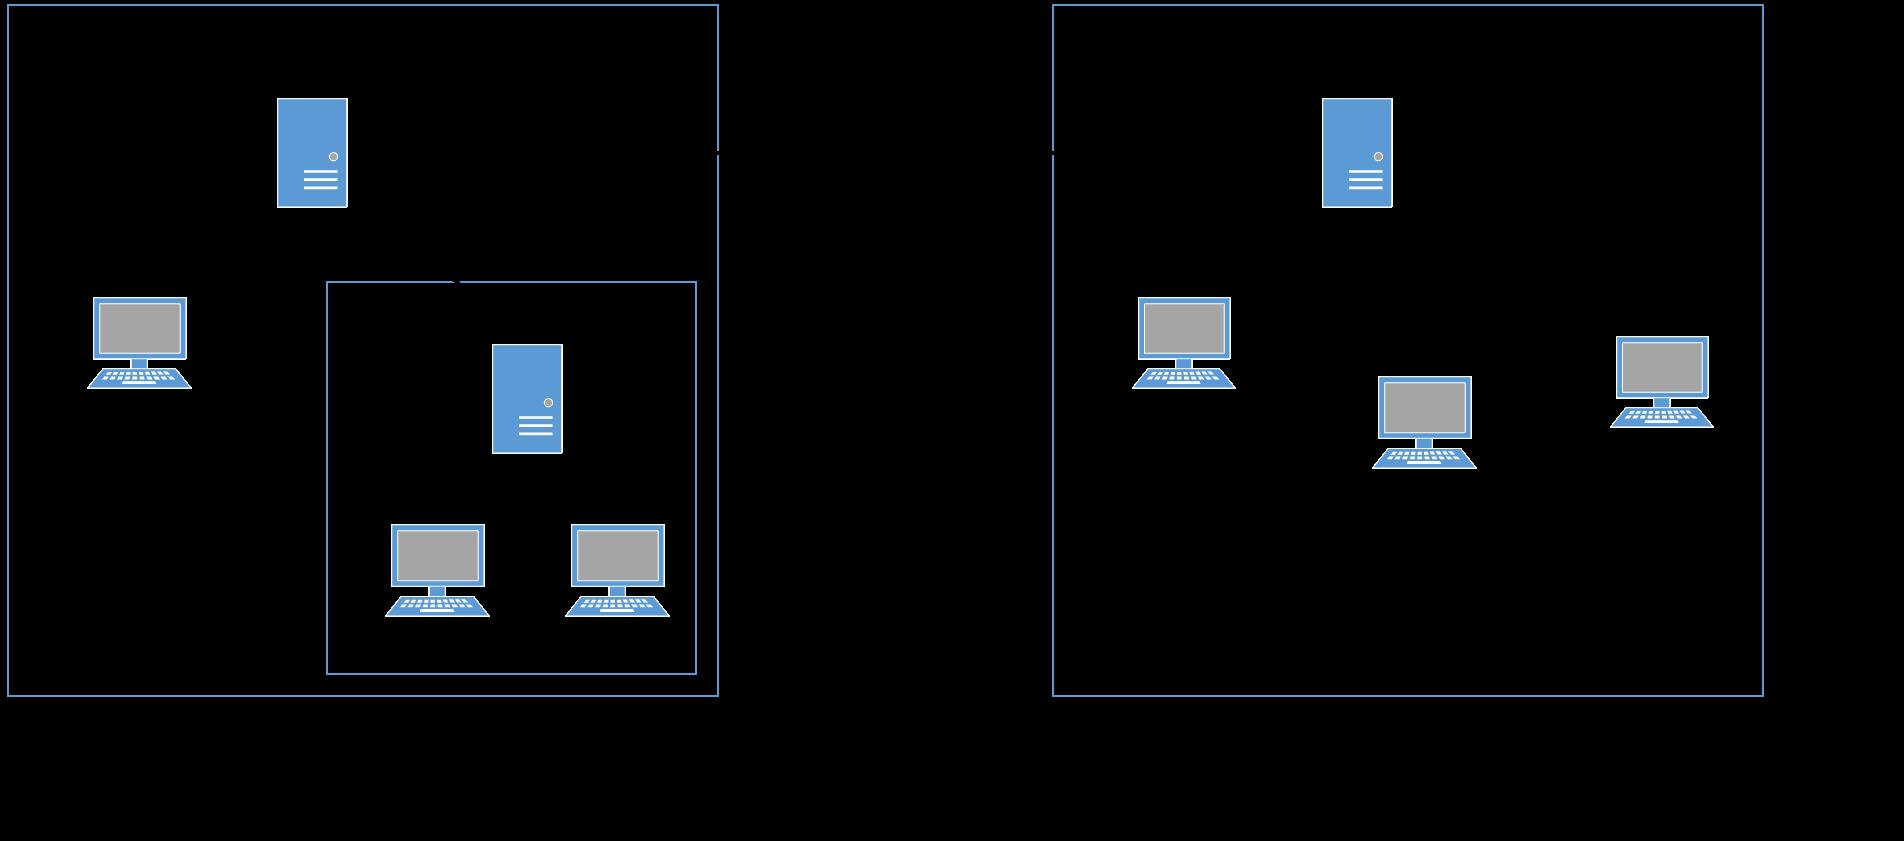 X.400 Netzwerk Topologie